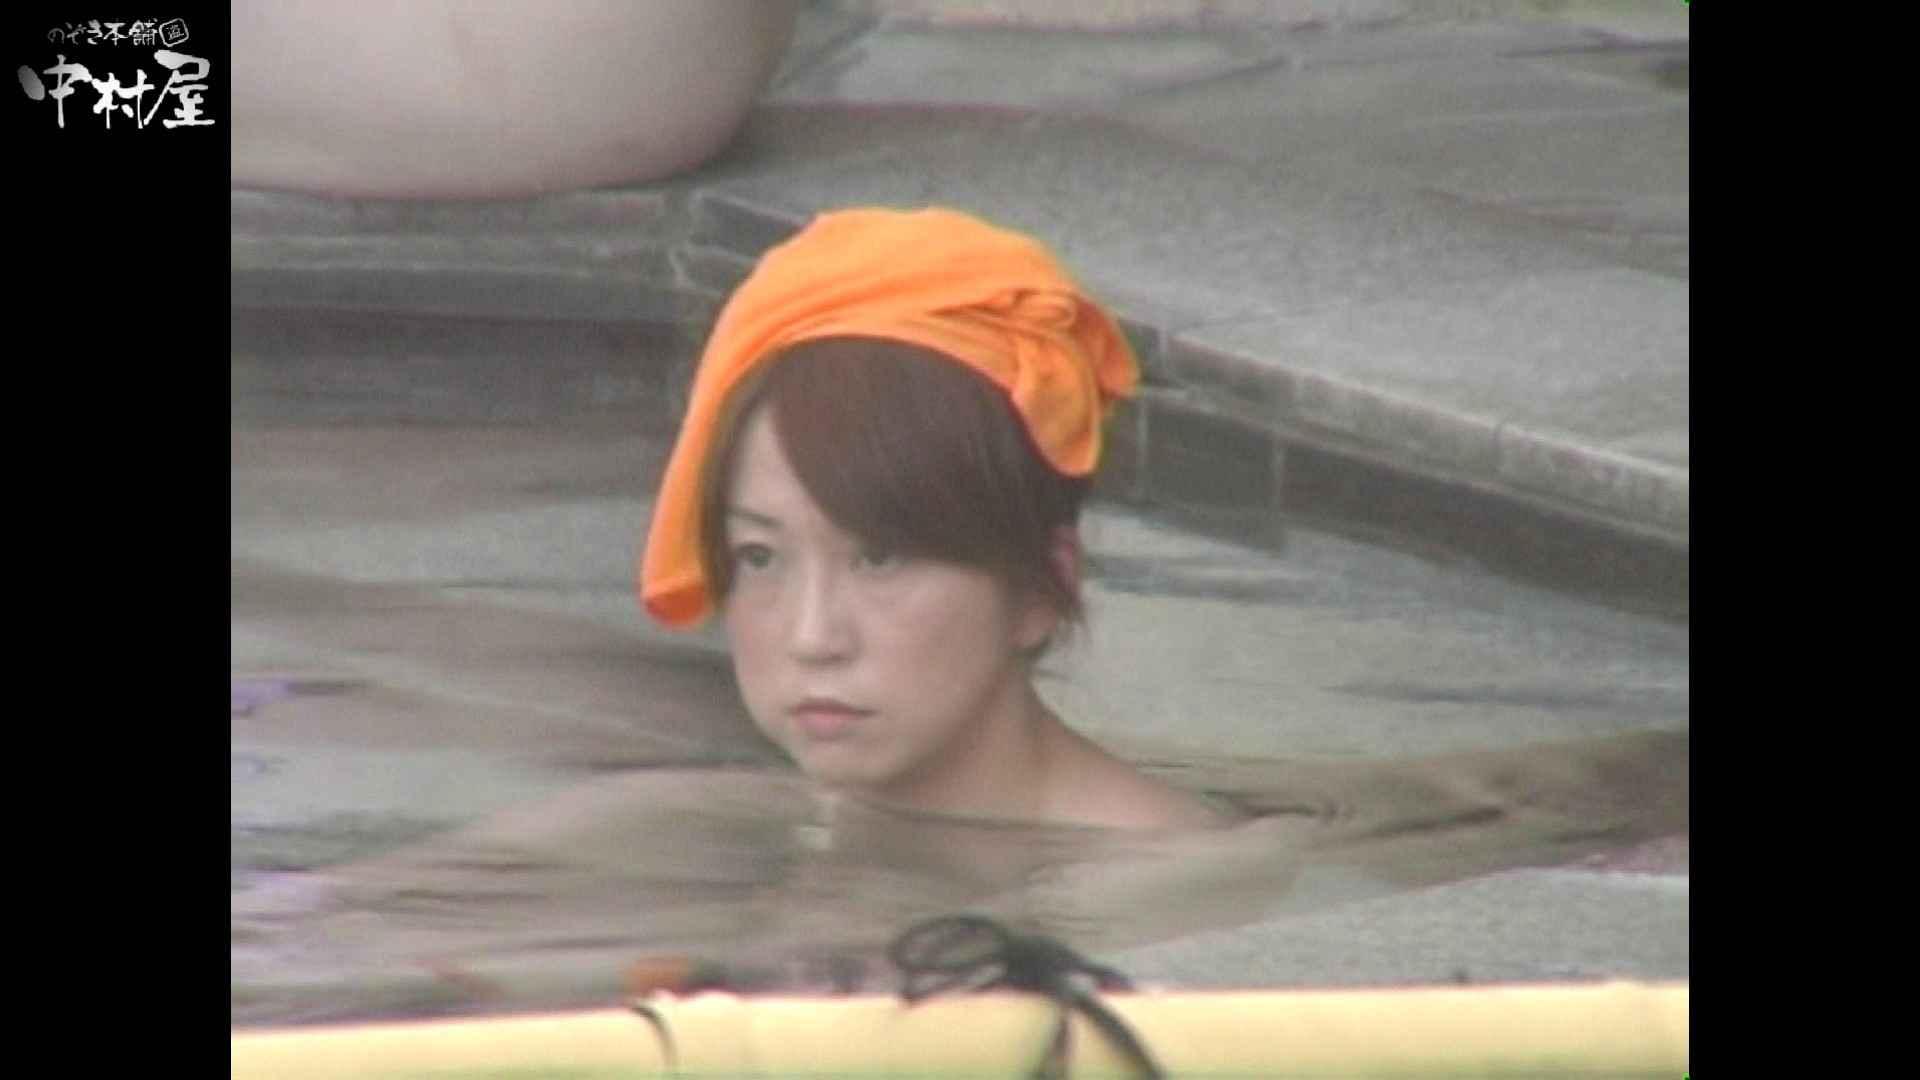 Aquaな露天風呂Vol.941 OLセックス  49画像 18